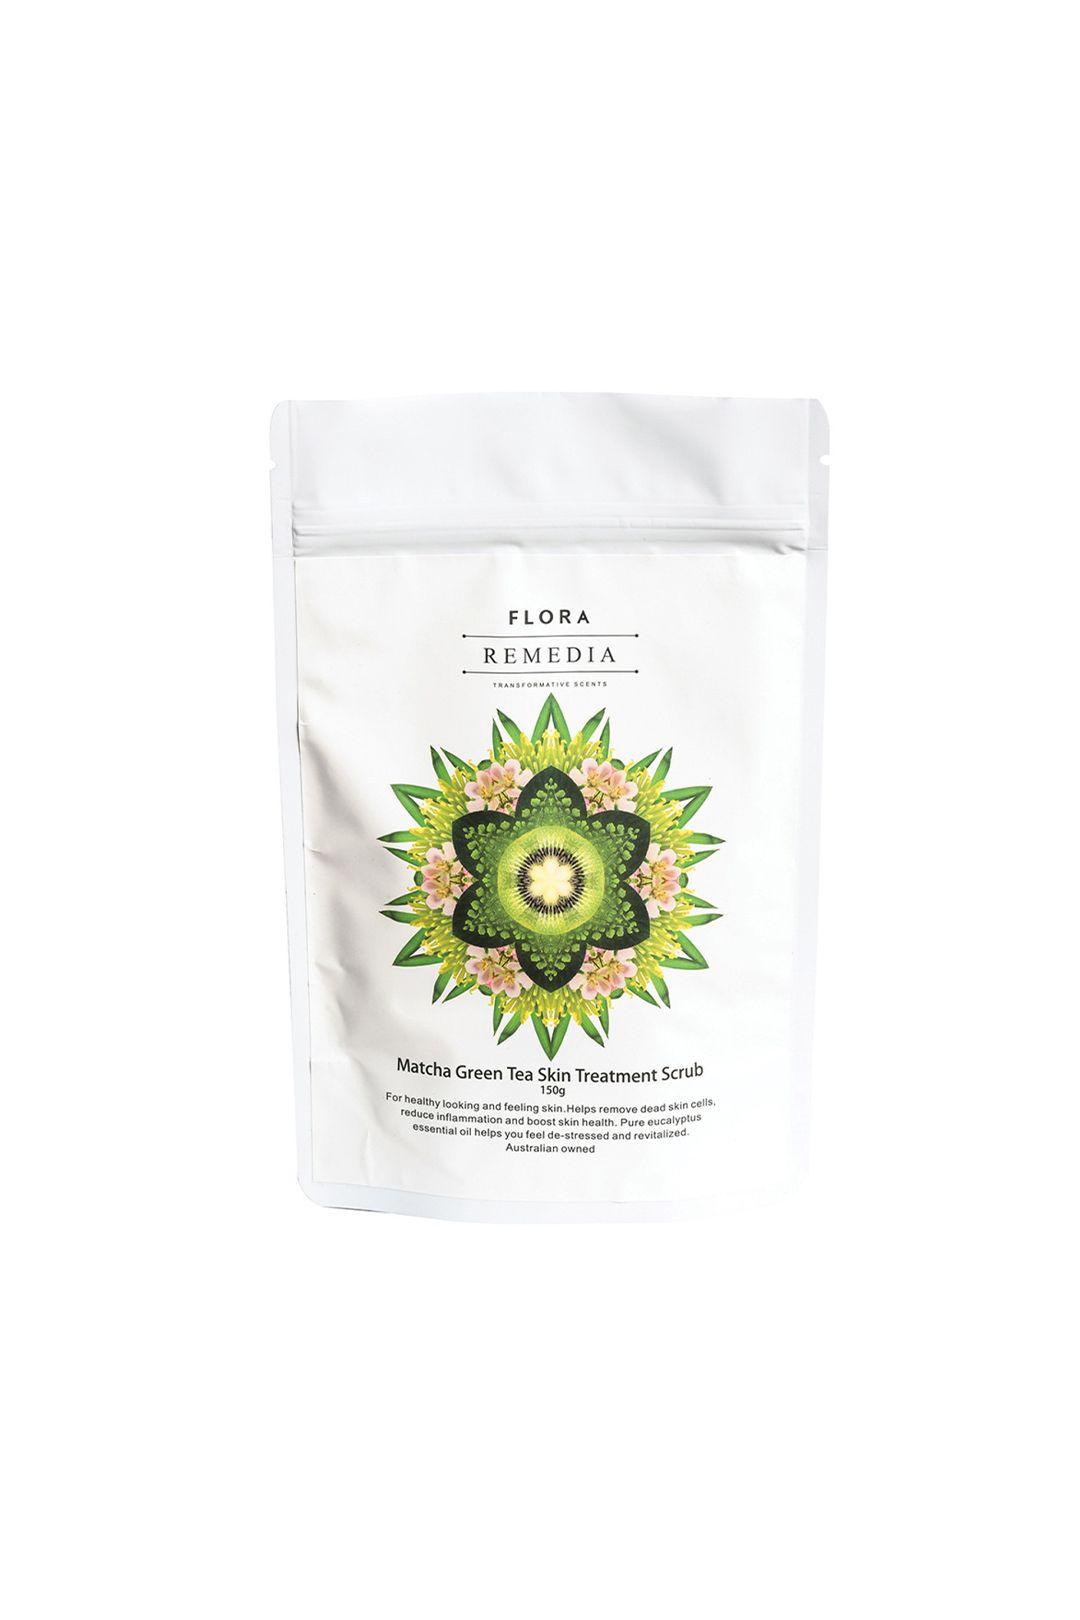 flora-remedia-matcha-green-tea-skin-treatment-scrub-150g